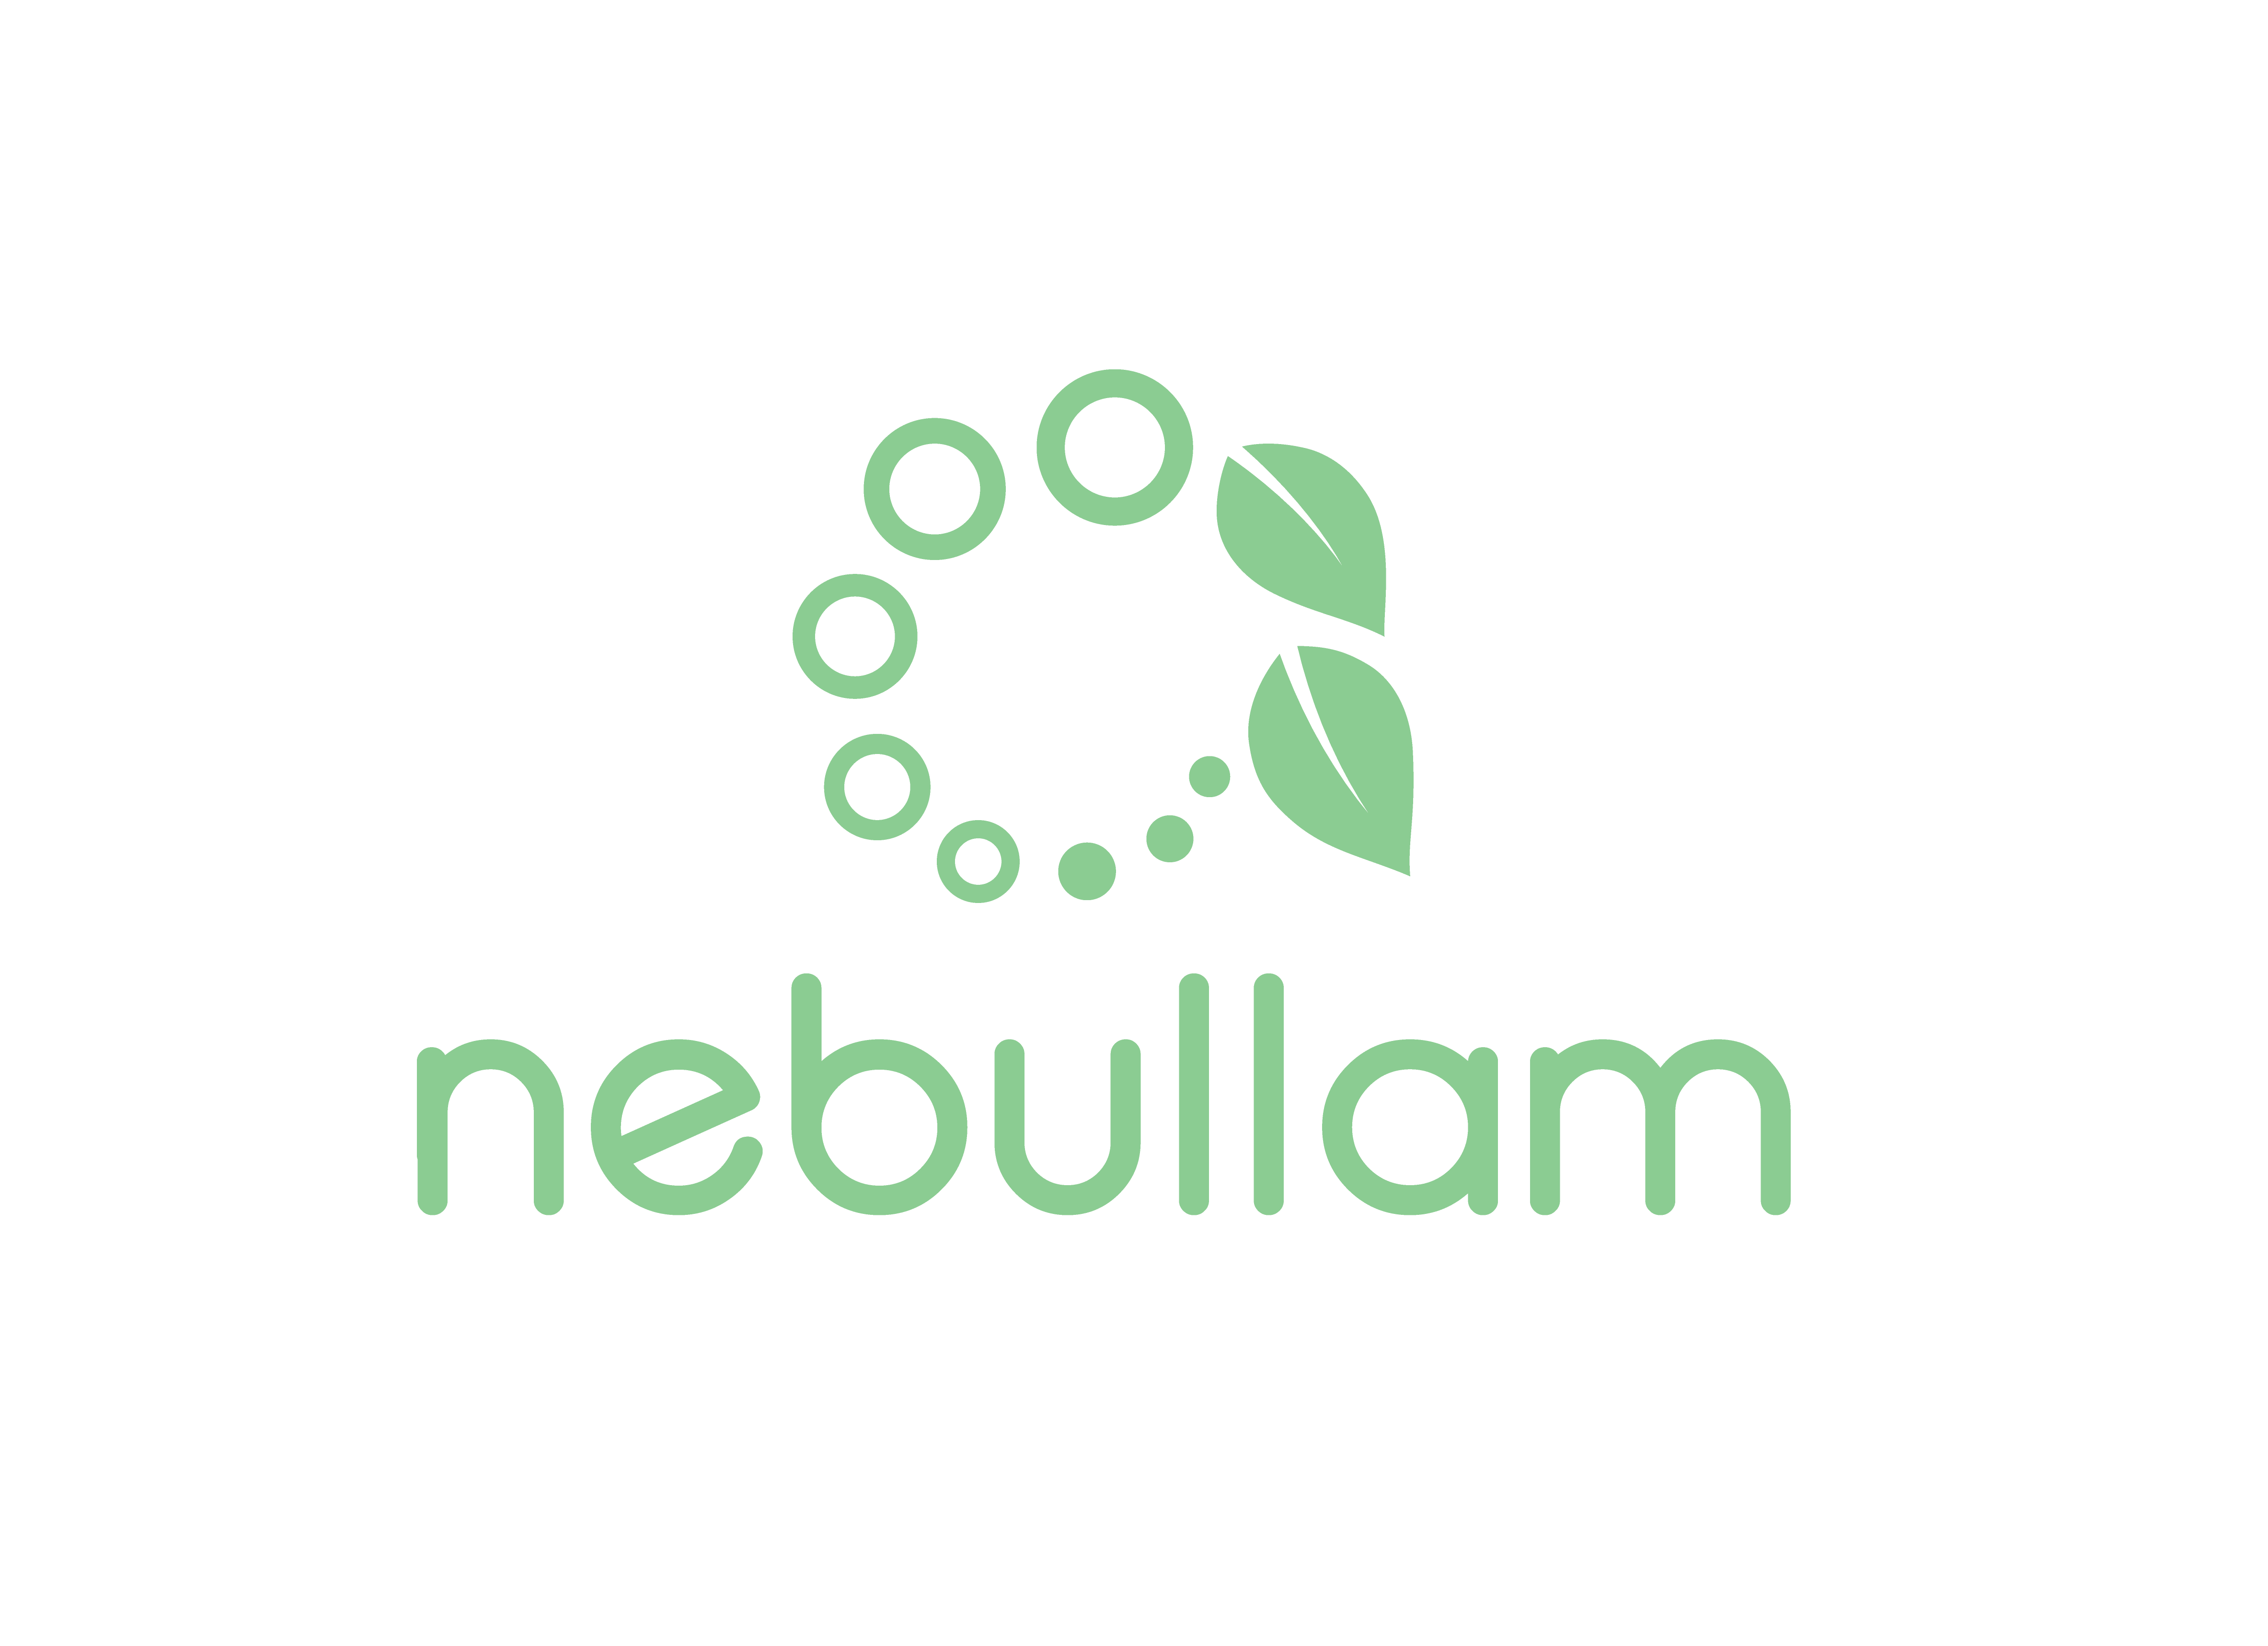 Nebullam Logo